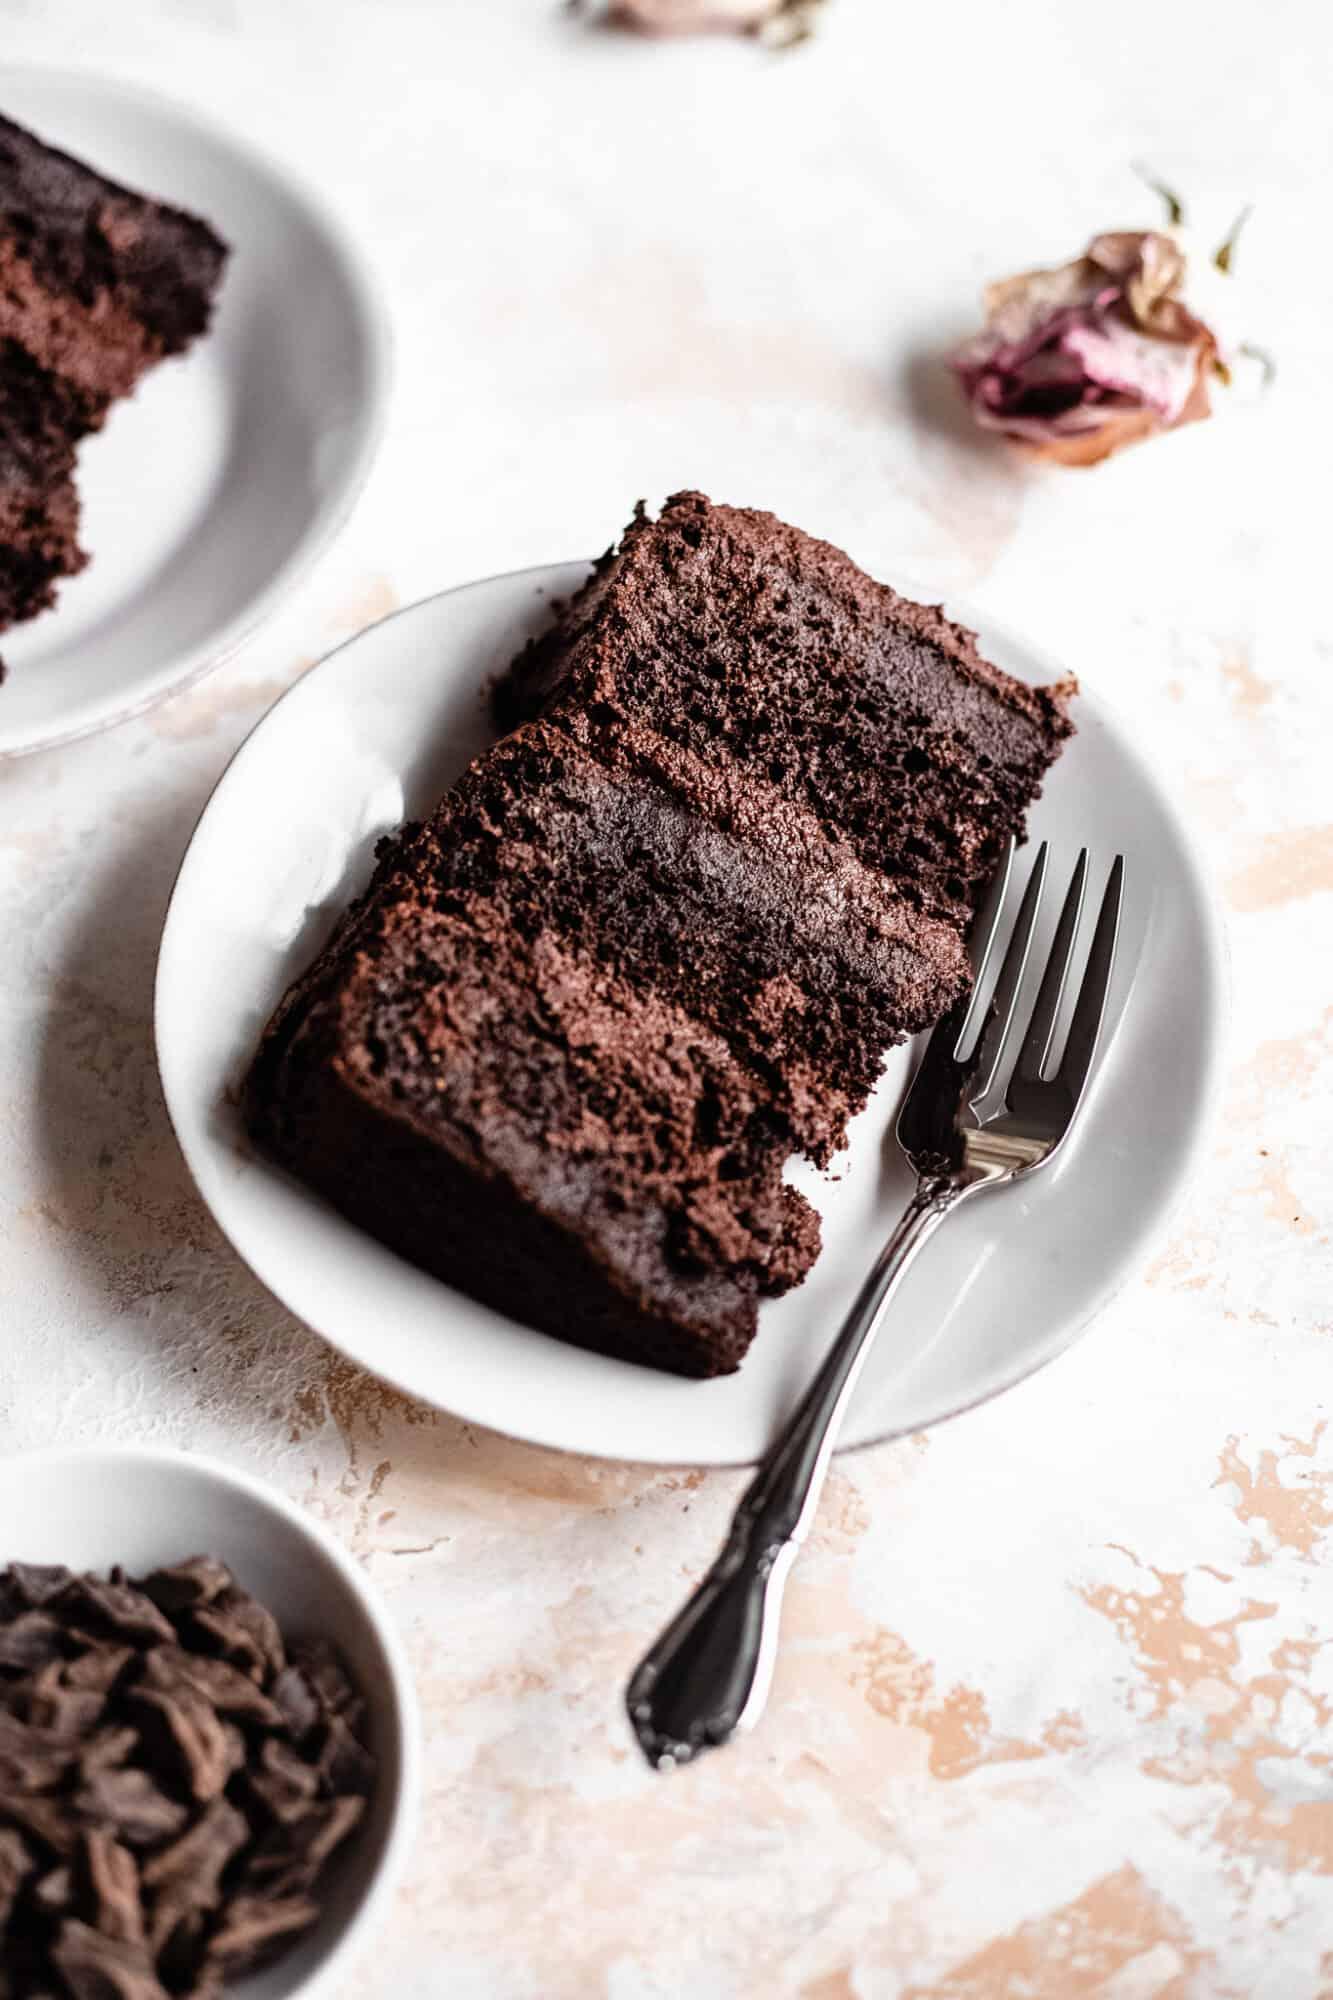 slice of gluten free vegan chocolate cake on a plate